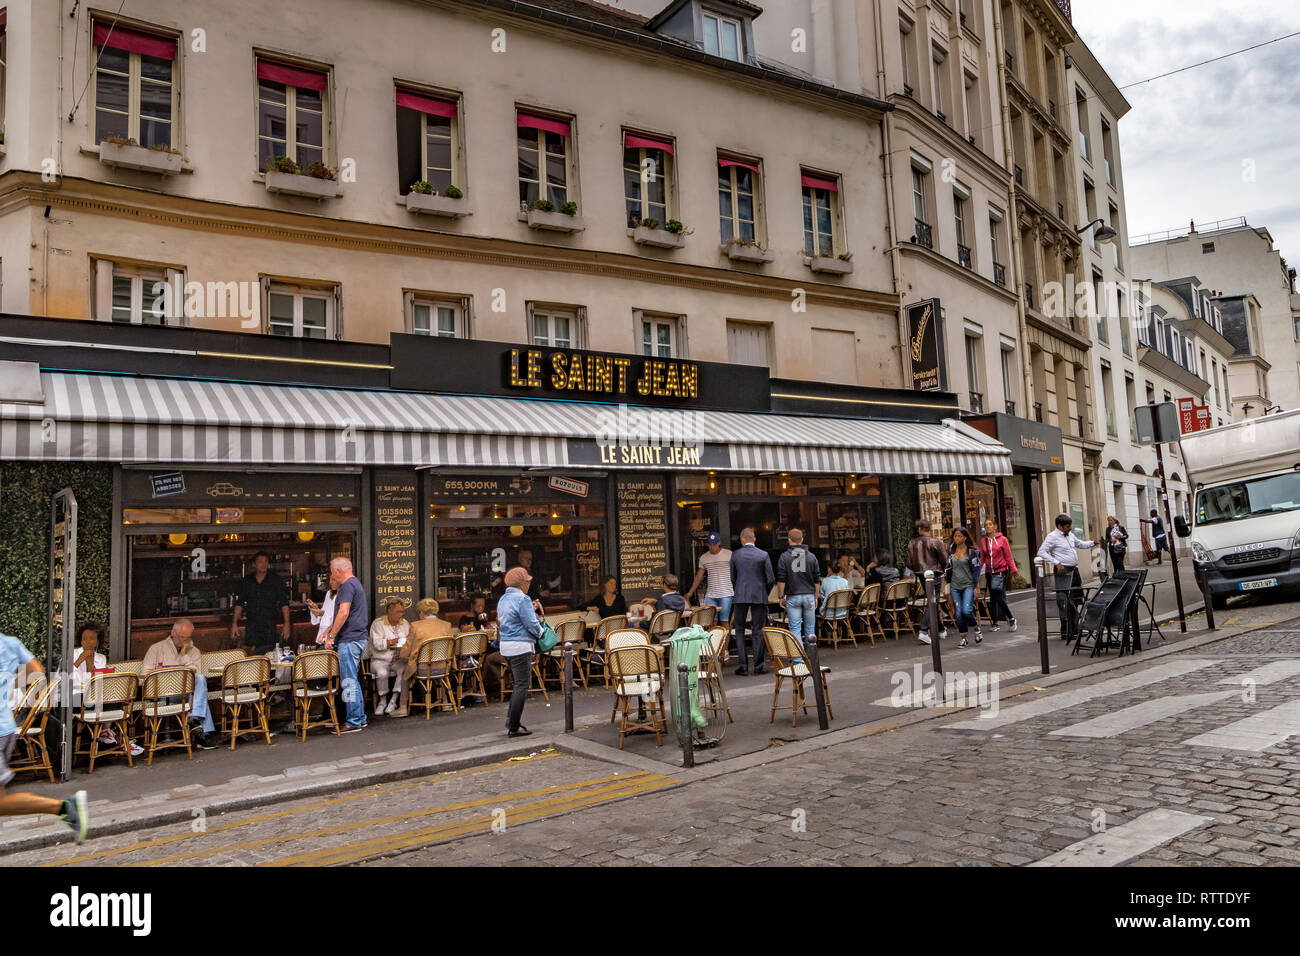 e1f391cac0 People sitting outside Le Saint-Jean café restaurant on rue des Abbesses in  Montmartre